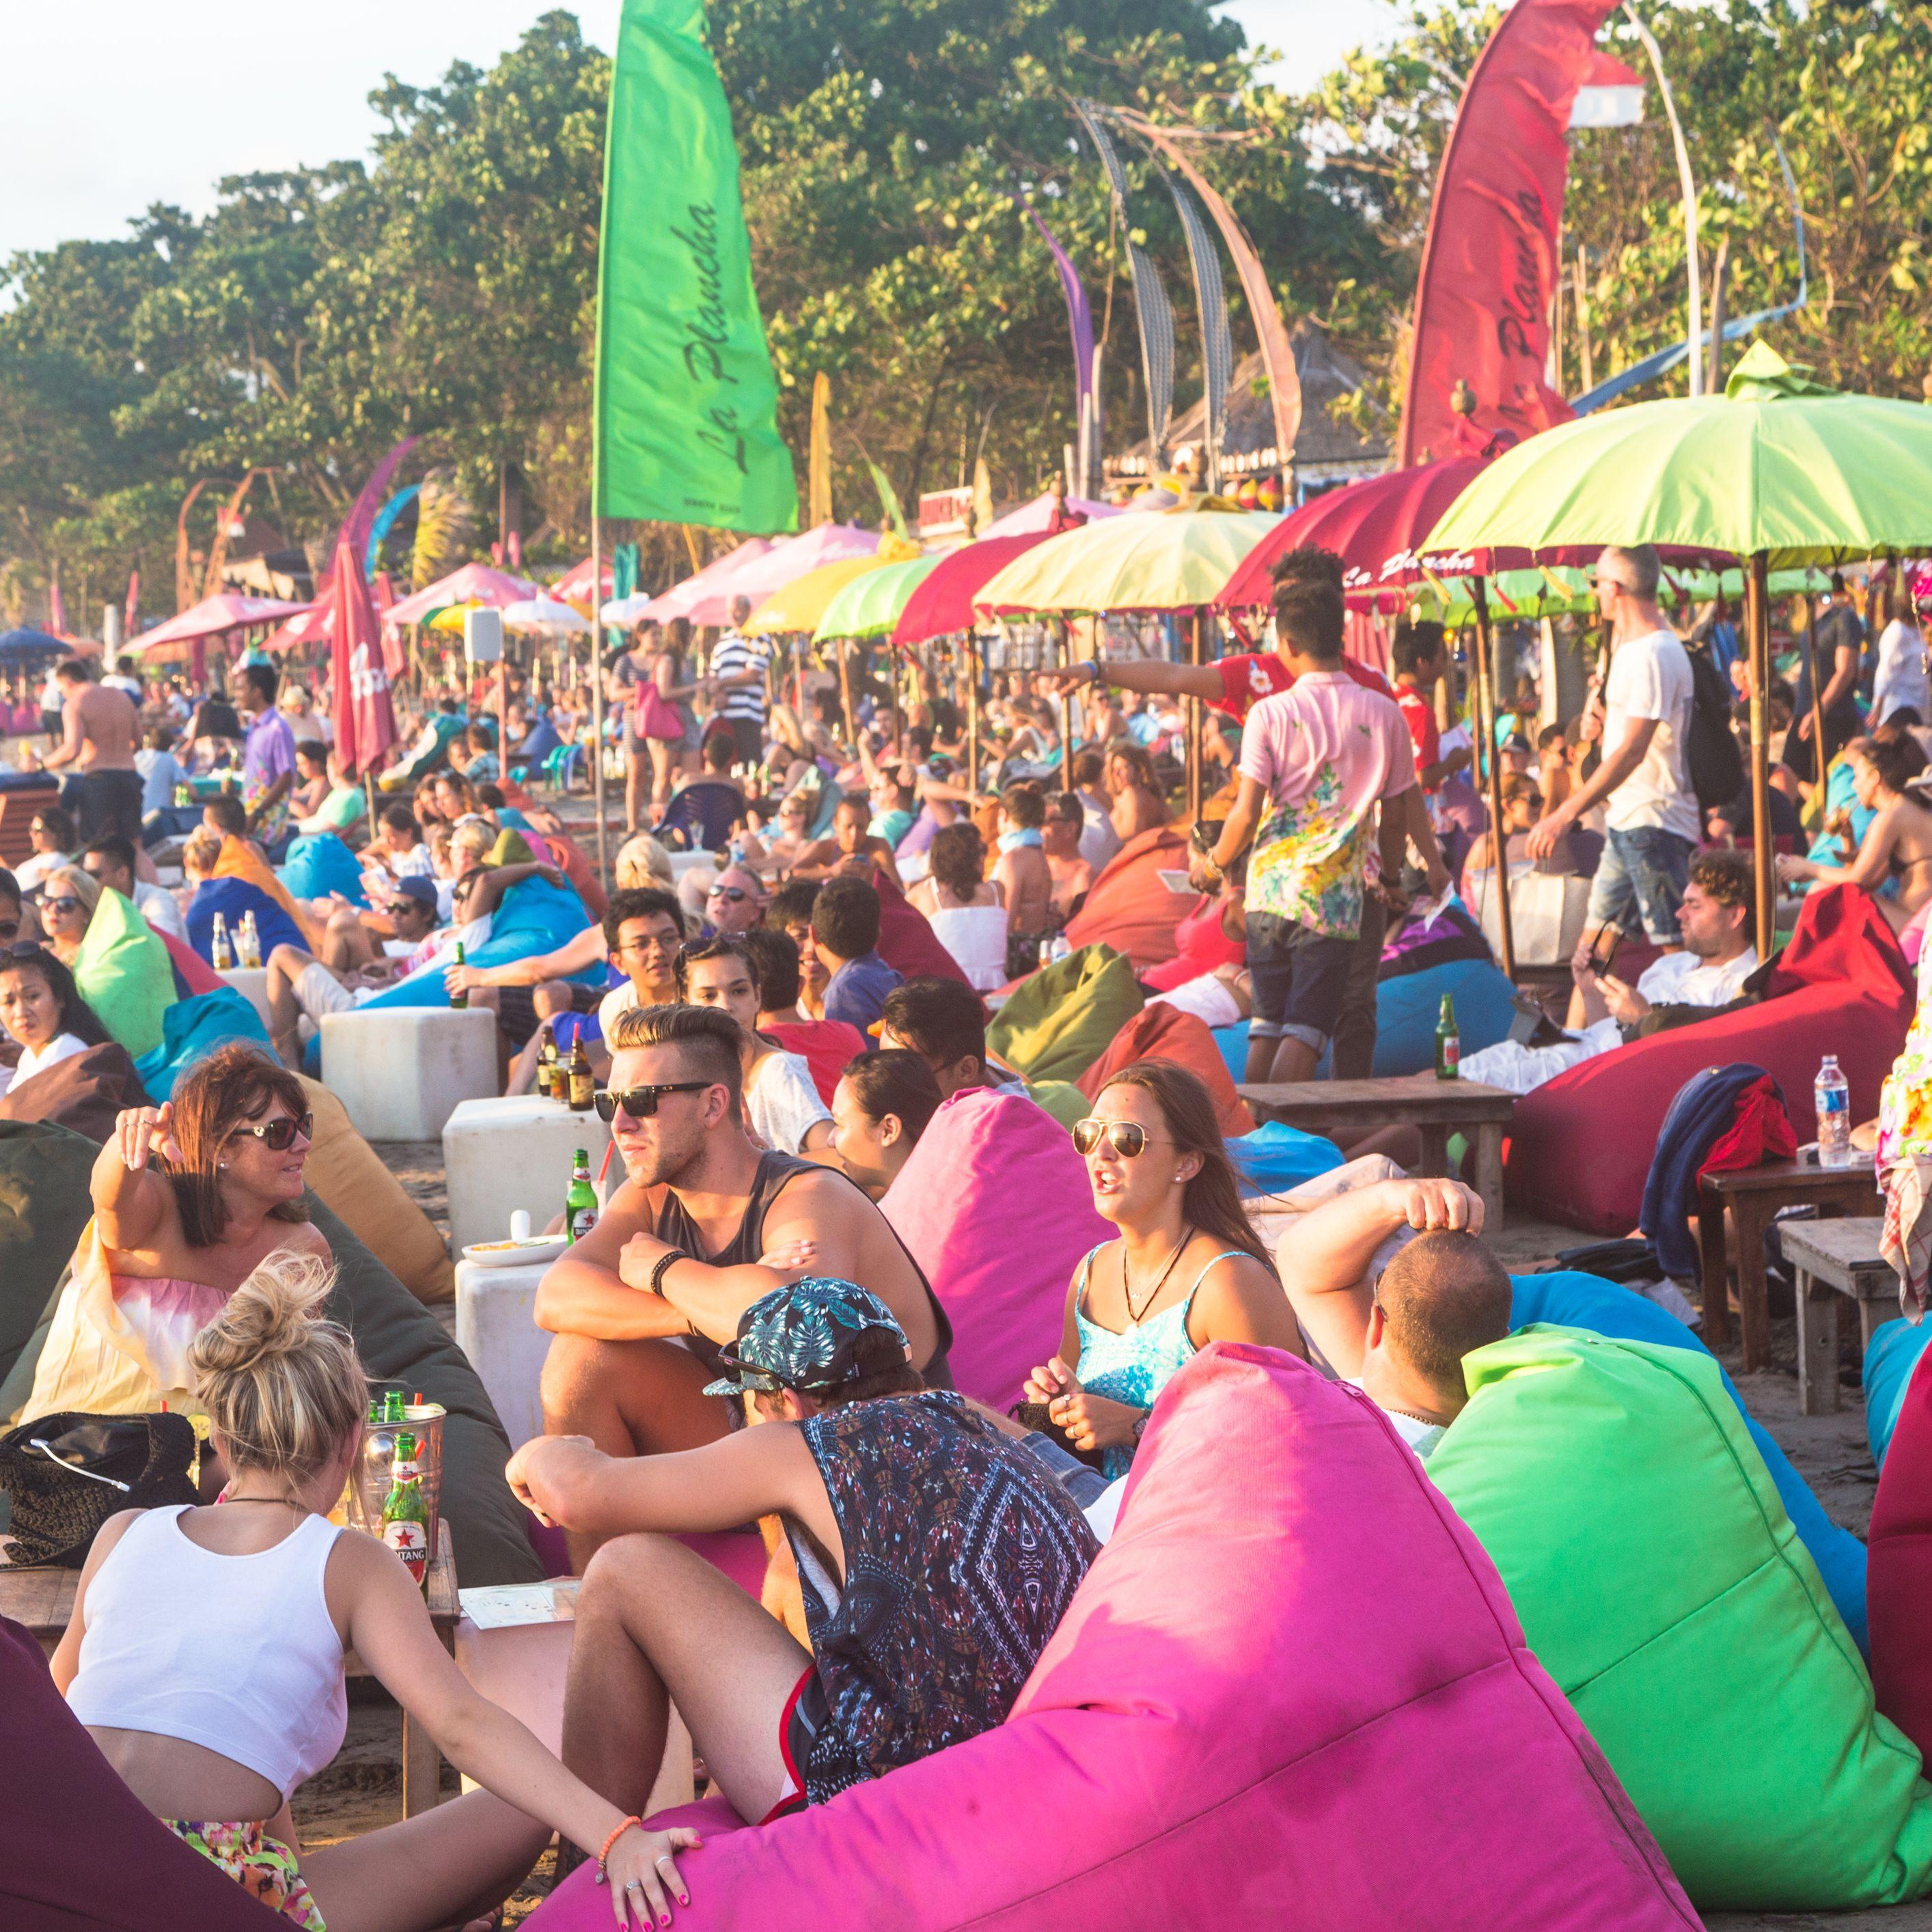 Nightlife in Bali: Best Bars, Clubs, & More